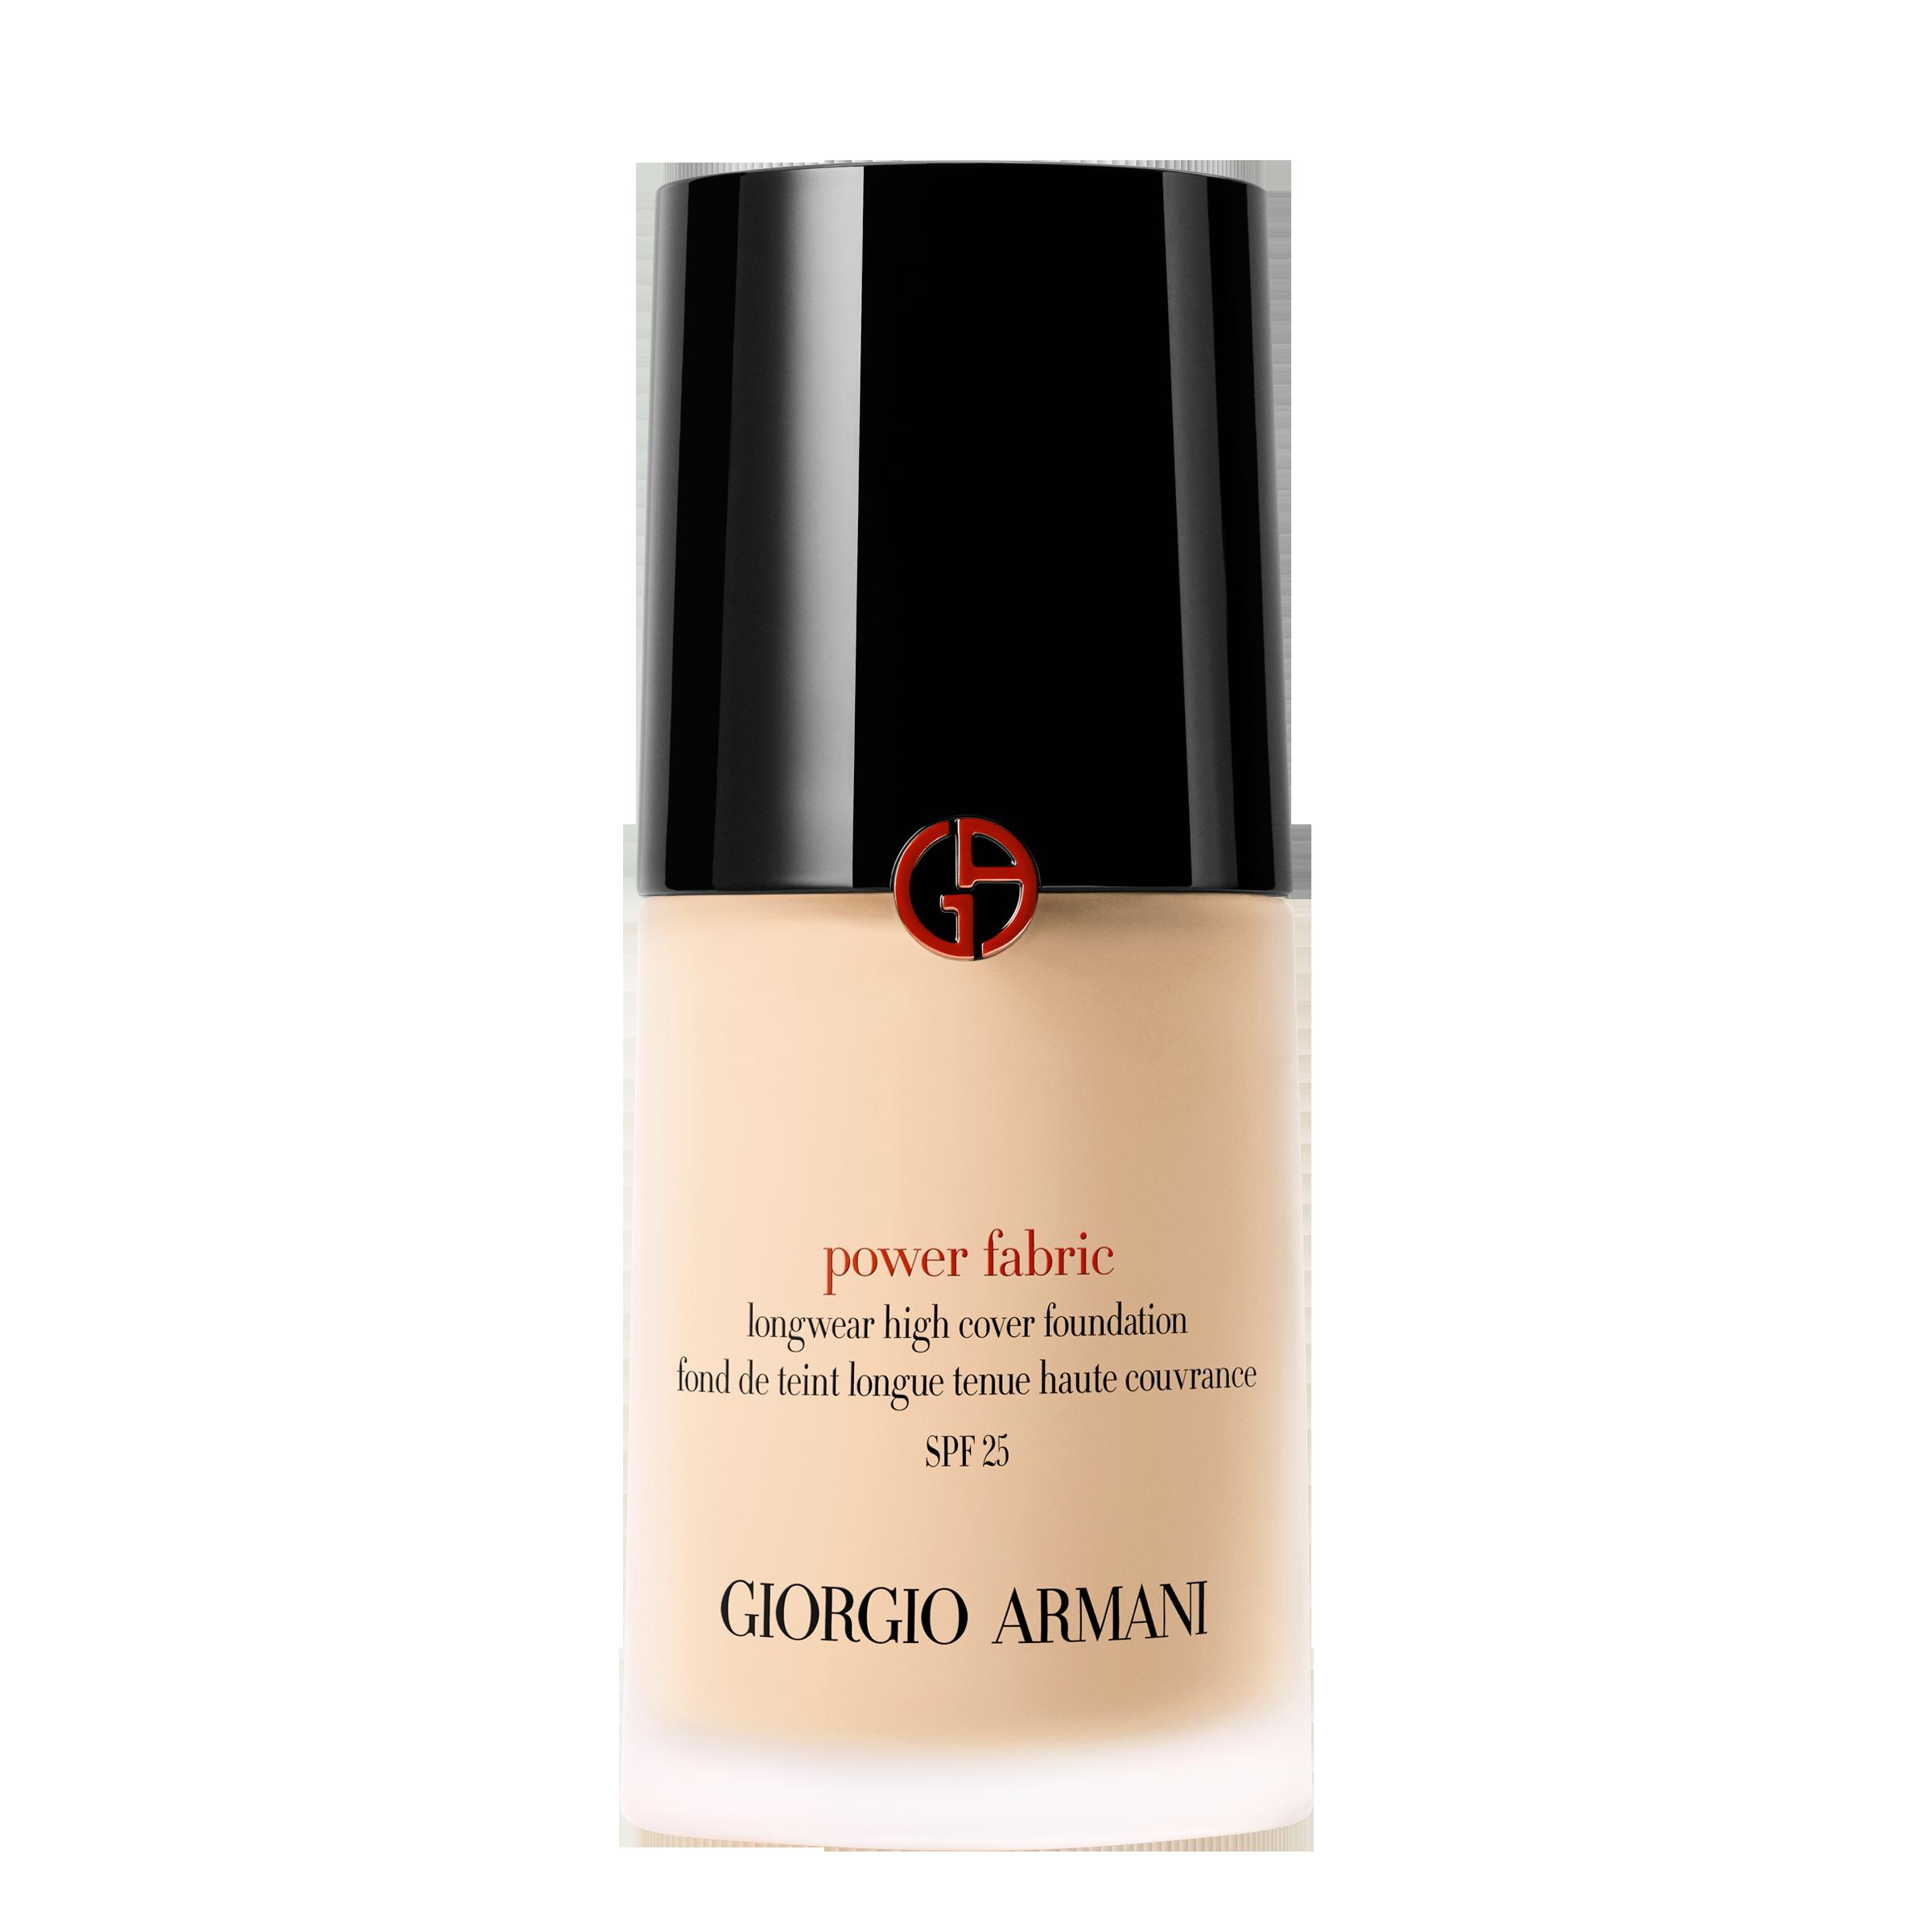 Armani Beauty Beauty caenskincareskincare Products By Armani caenskincareskincare iuTOZPkX